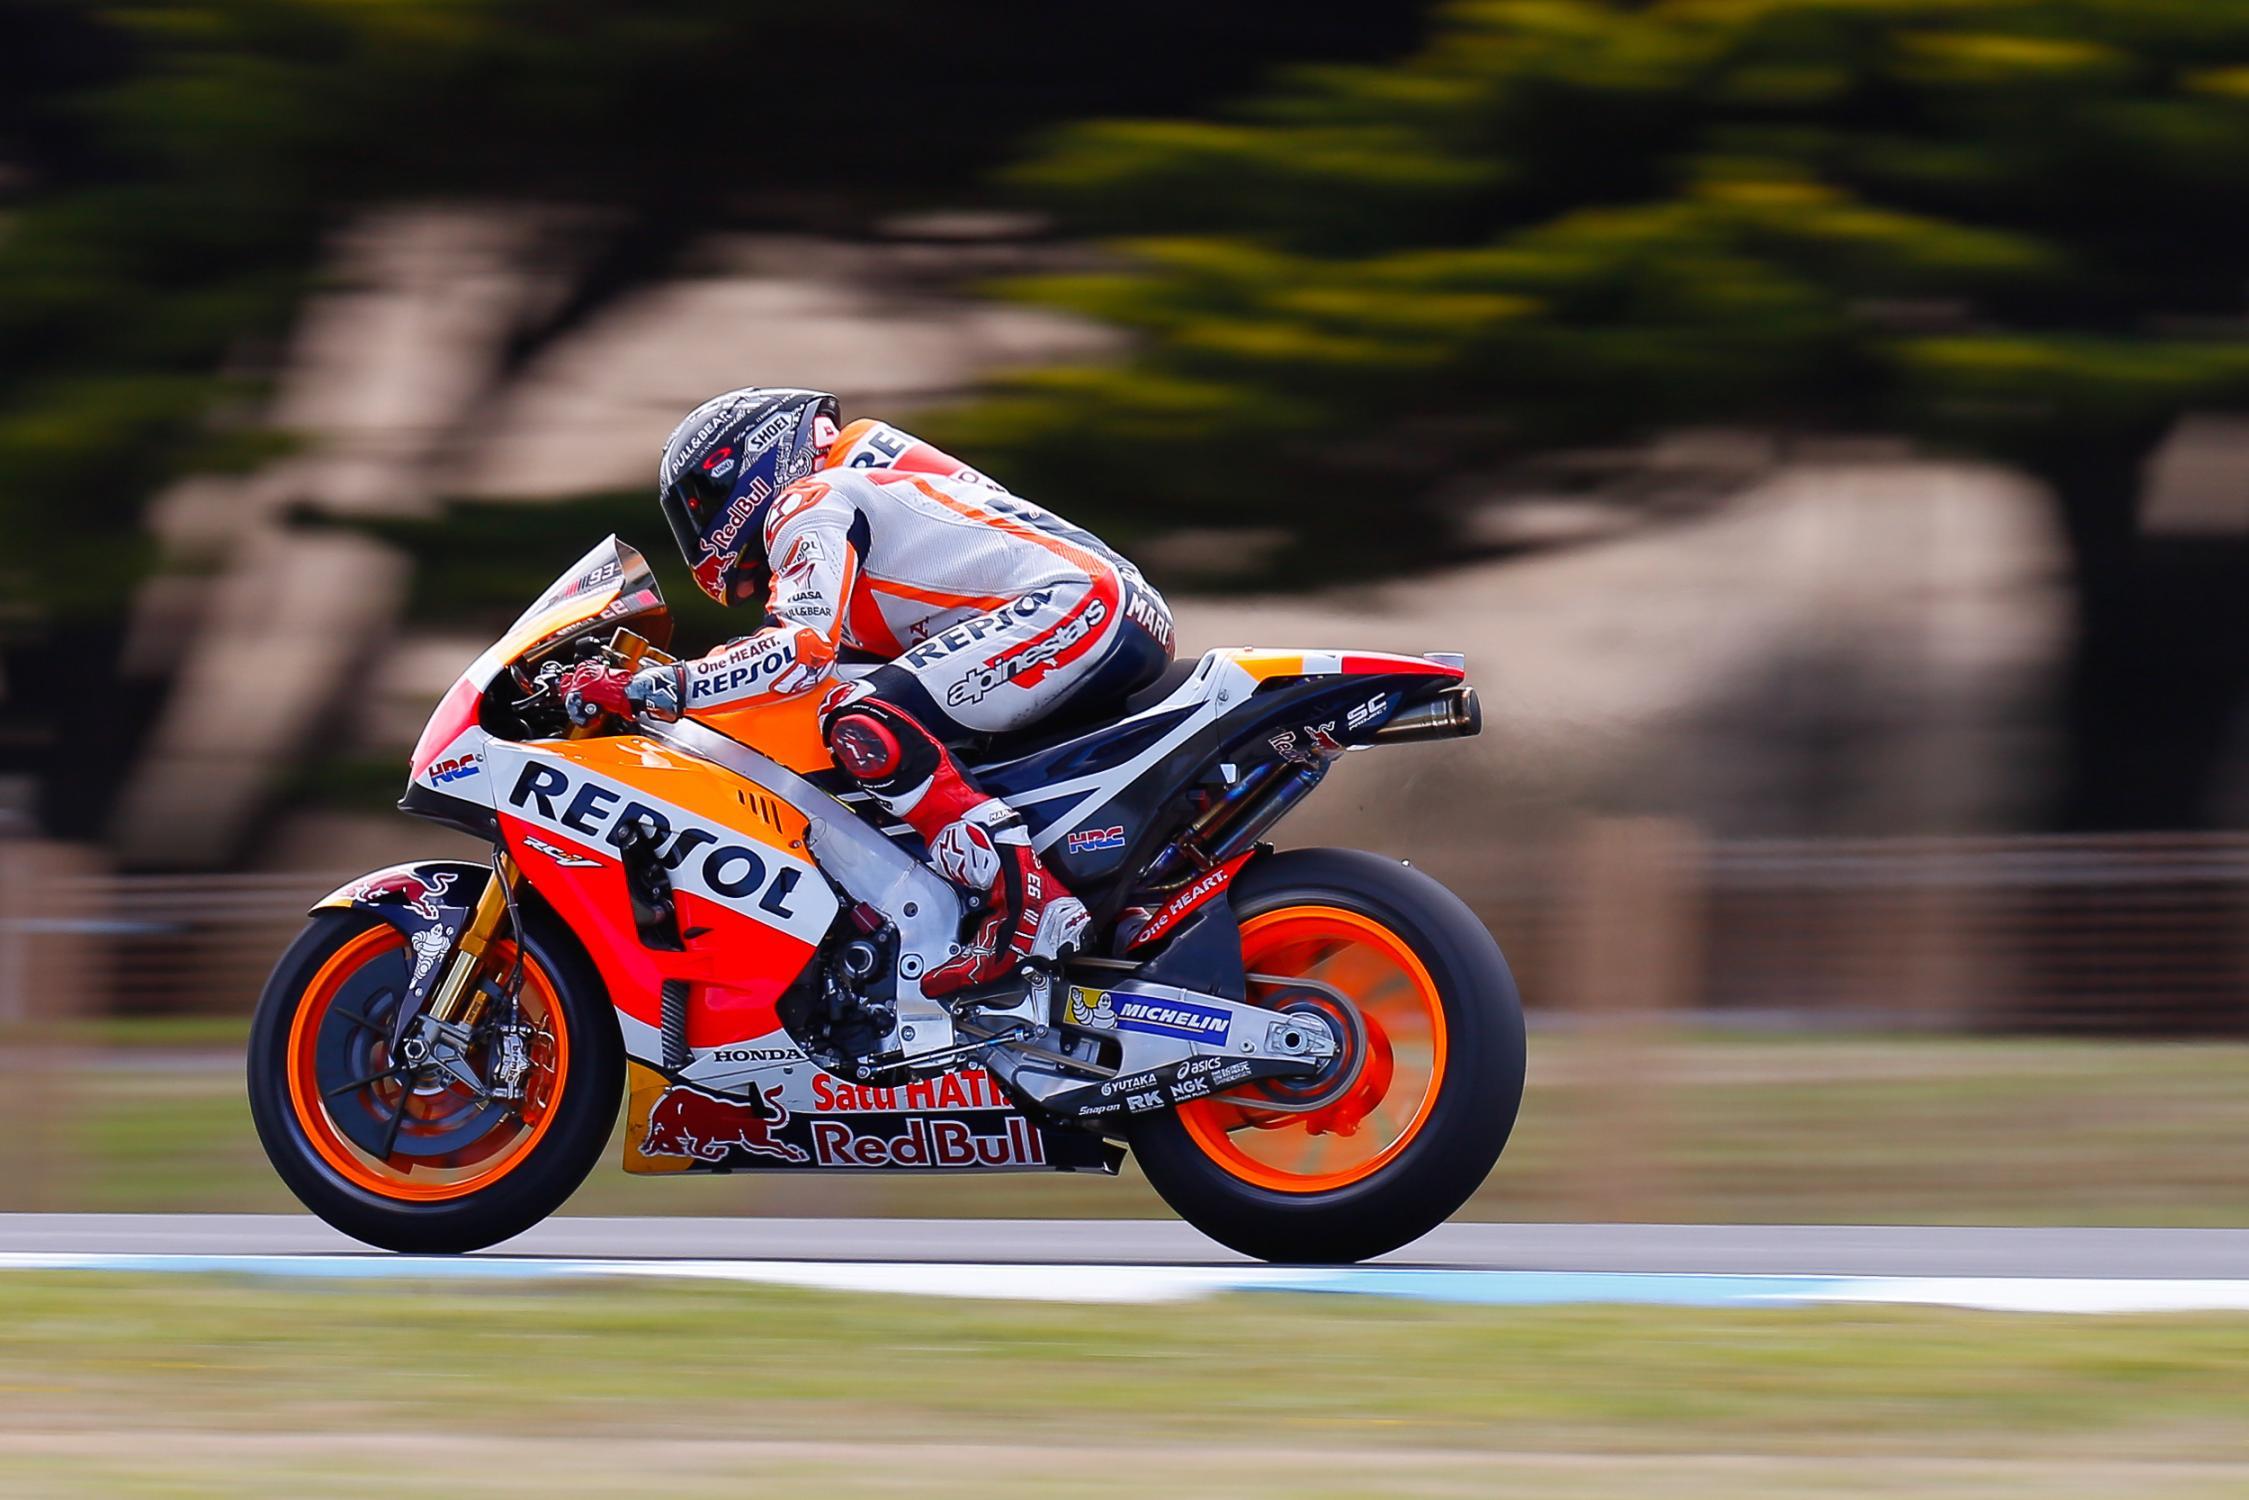 [MotoGP] Test Phillip Island 93-marc-marquez-esp-2017-action-australia-motogp-phillip-island-pre-season-test15686_test2017_action.gallery_full_top_fullscreen